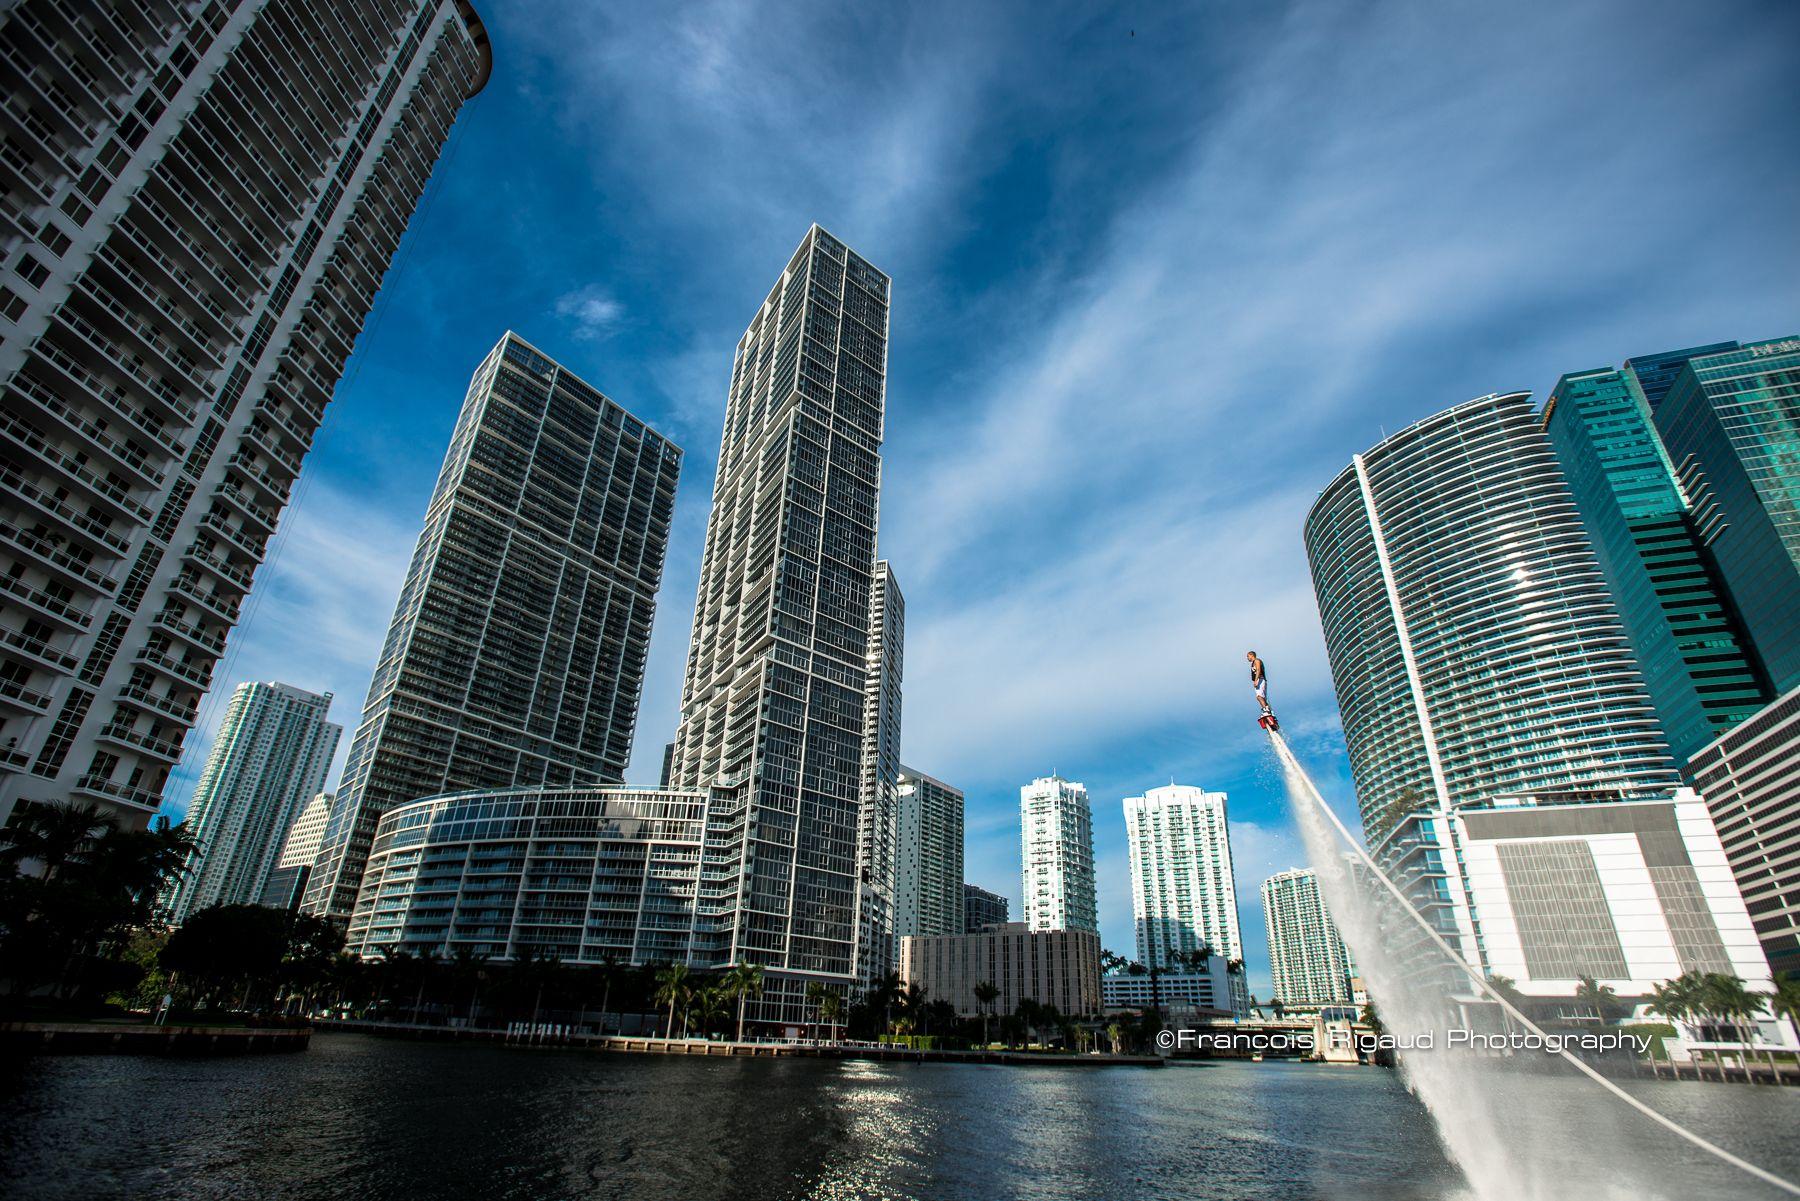 Flyboarding in Miami !